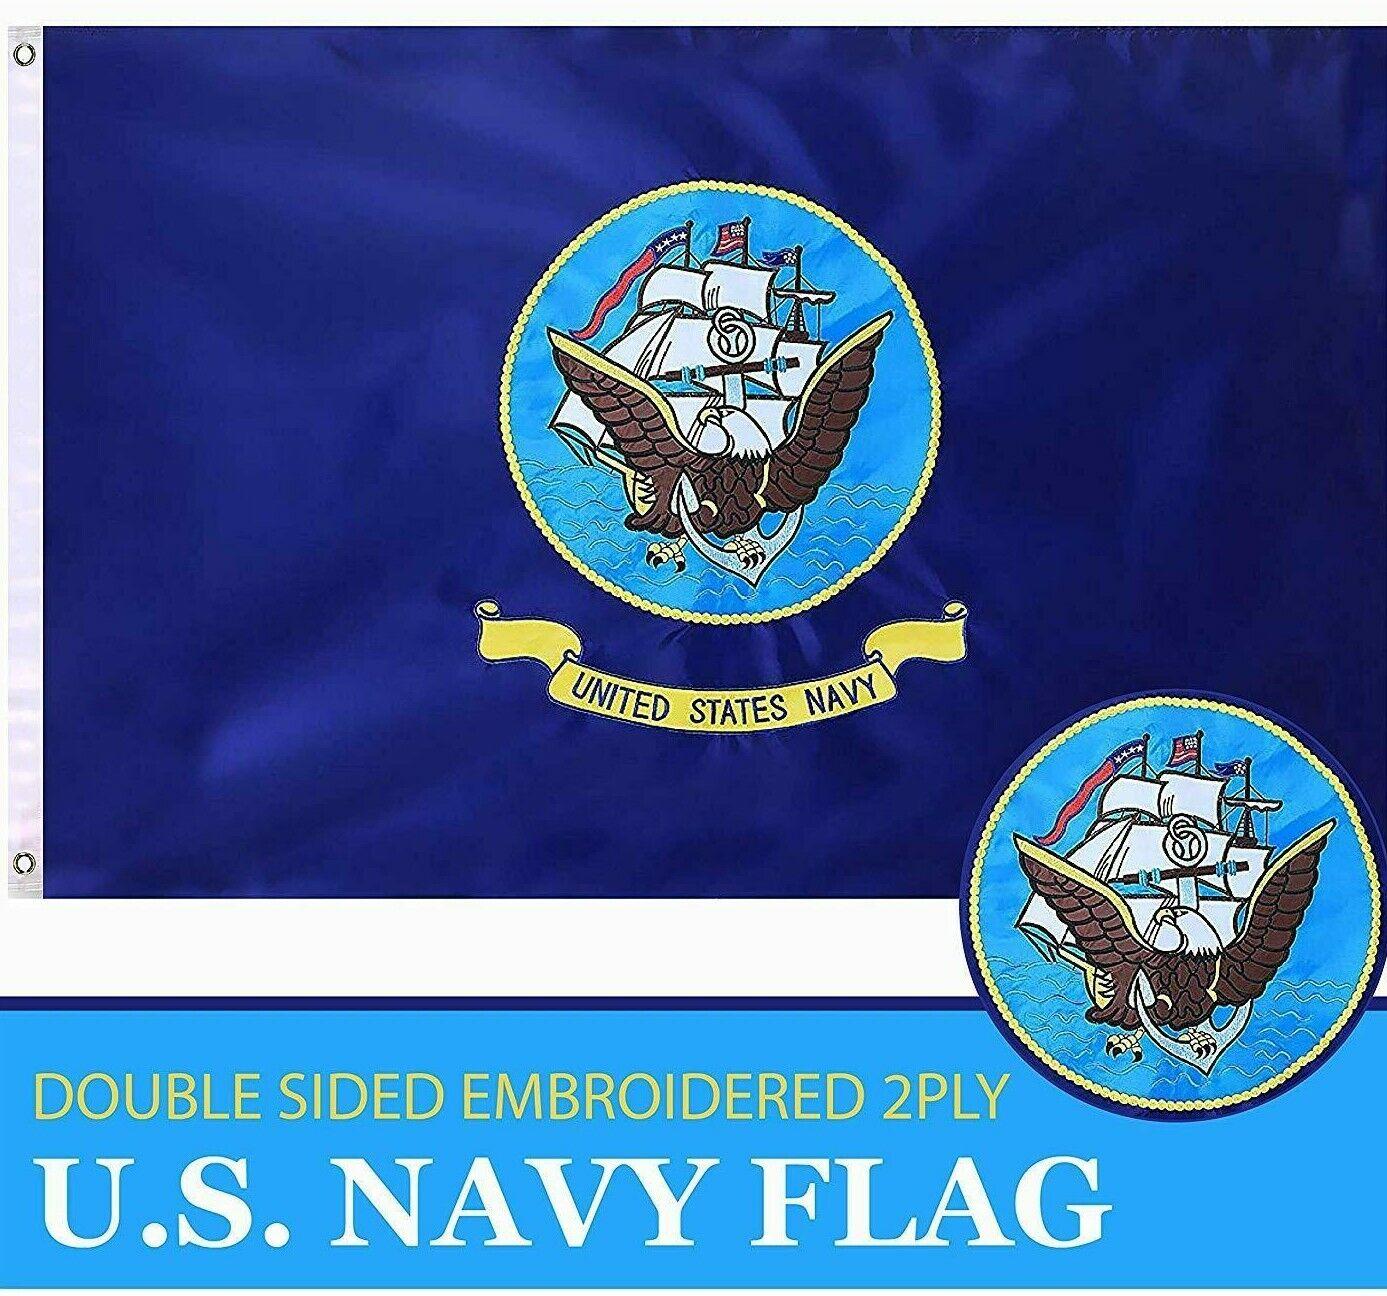 G128 - U.S. Navy Flag 3ftx5ft 3x5 3'x5' Double Sided 2ply Em